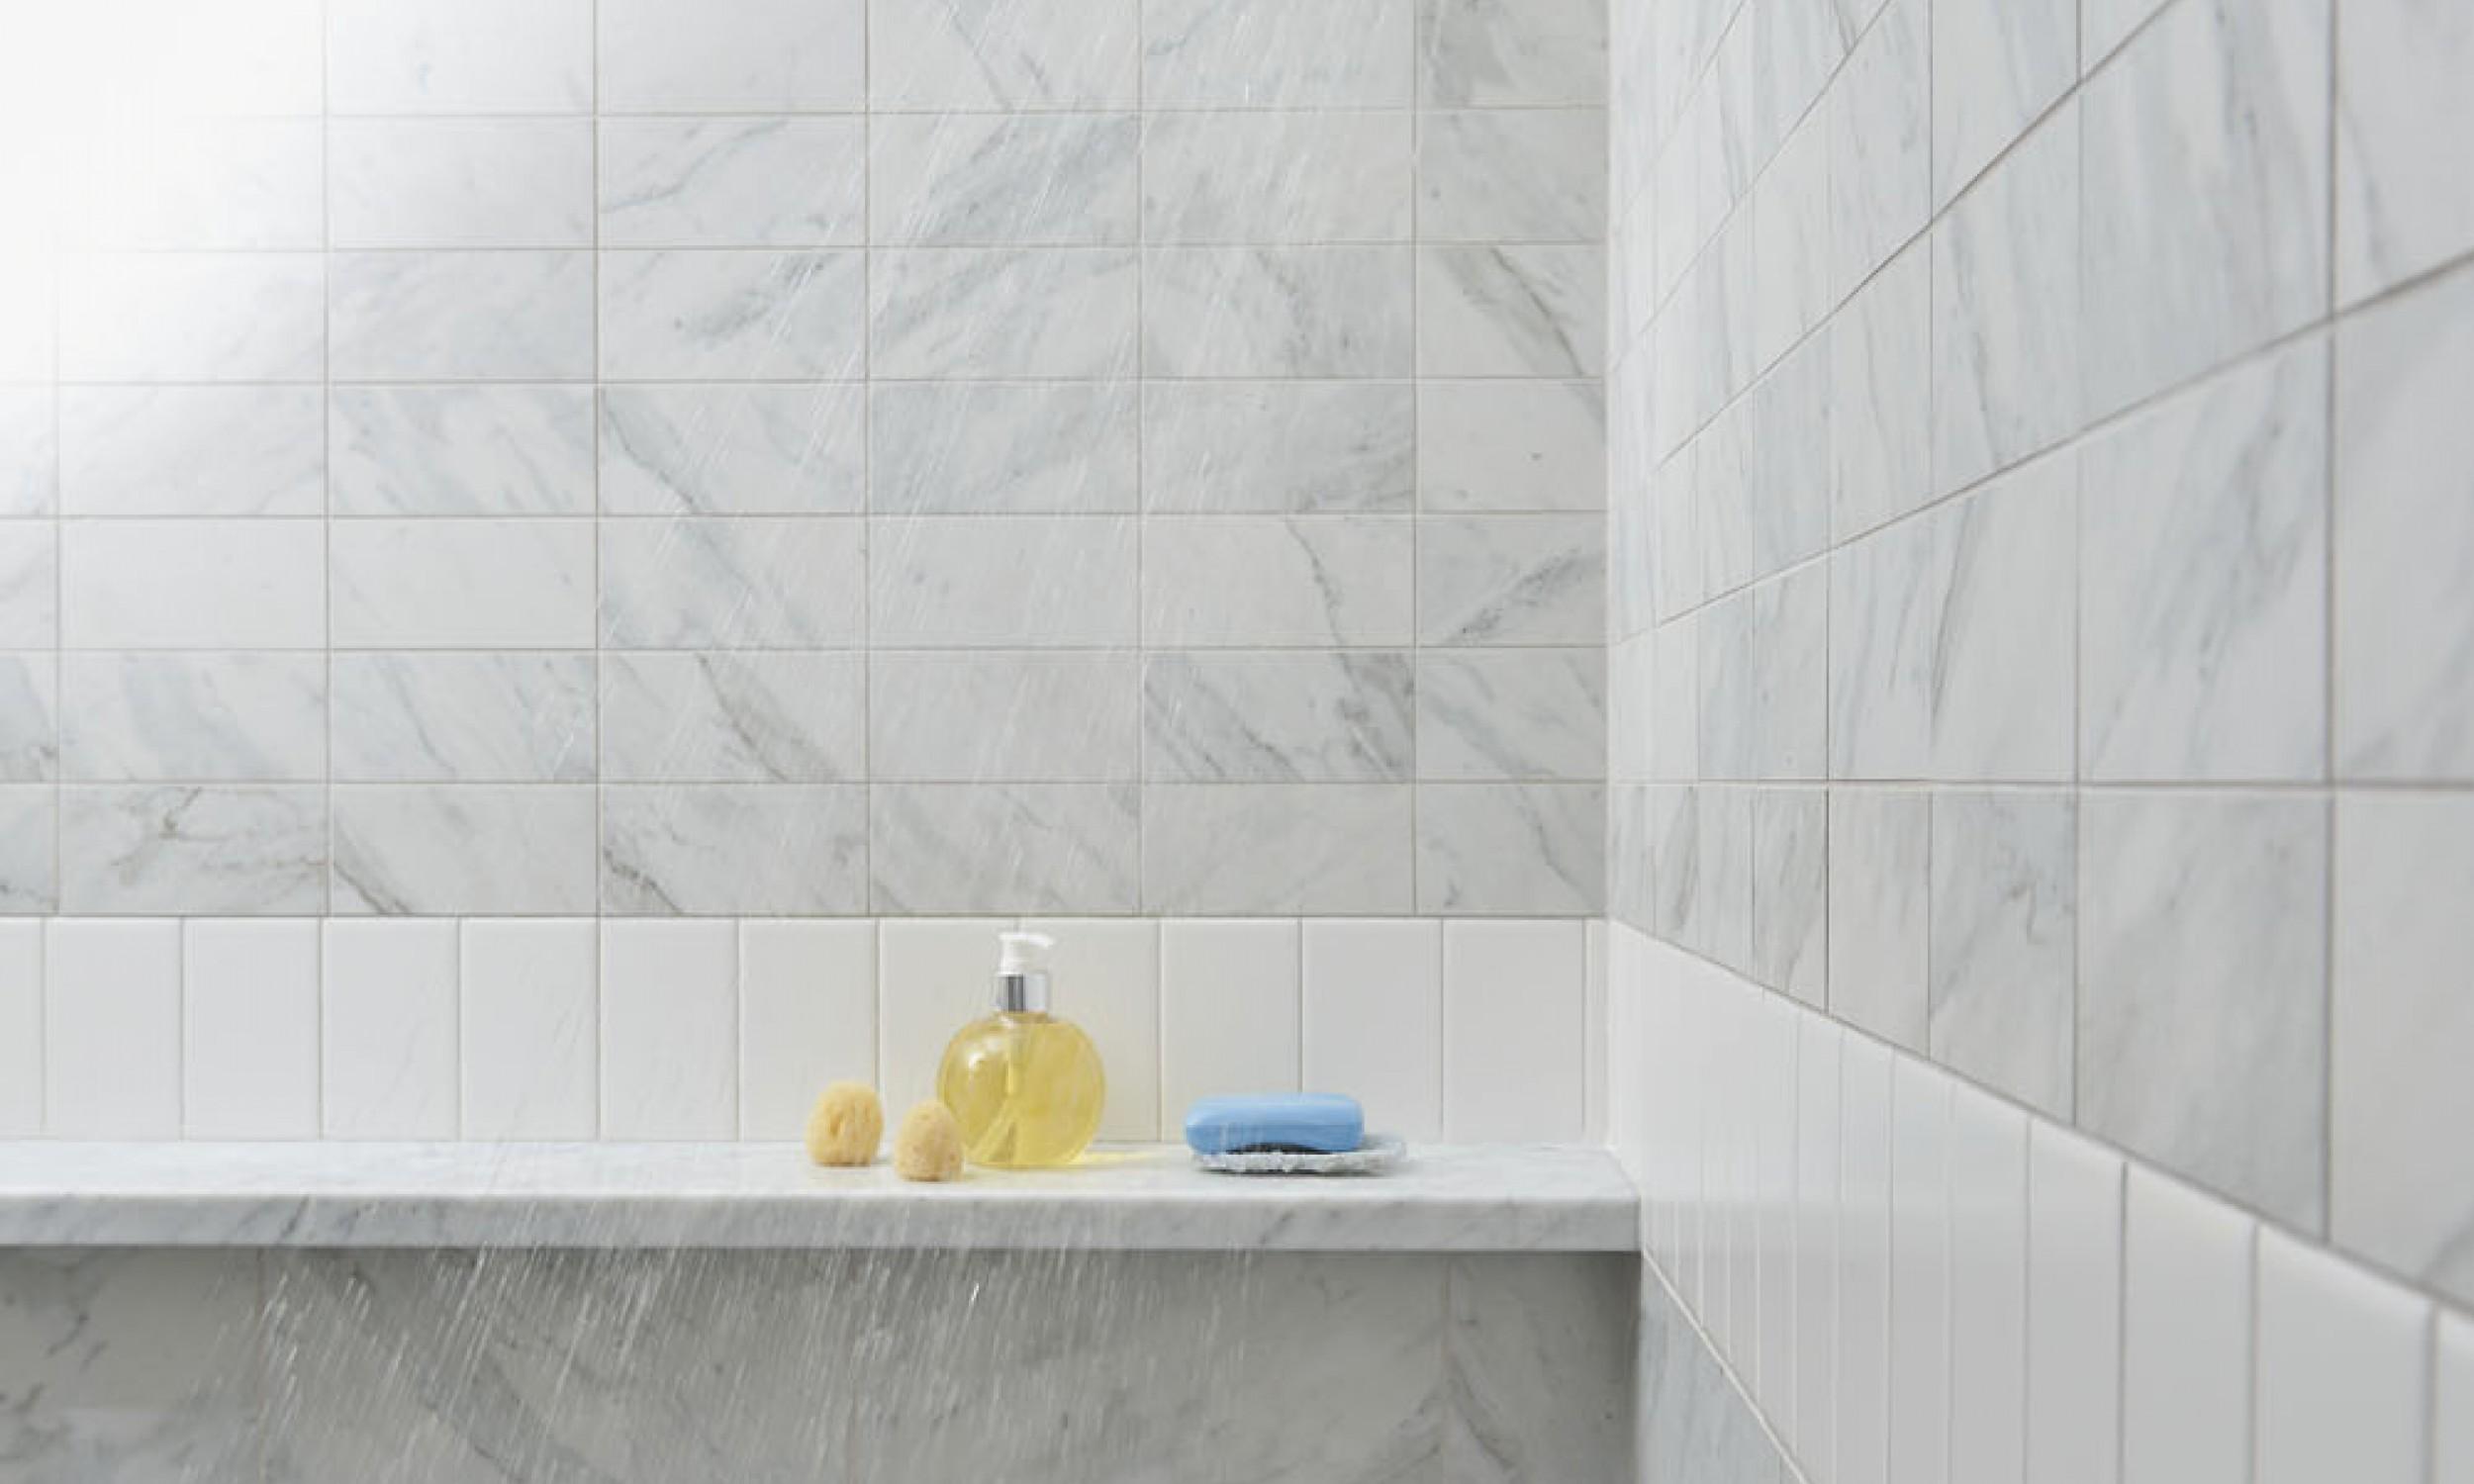 Tiled shower, carrara marble shelf, porcelain tile, Maine Architect